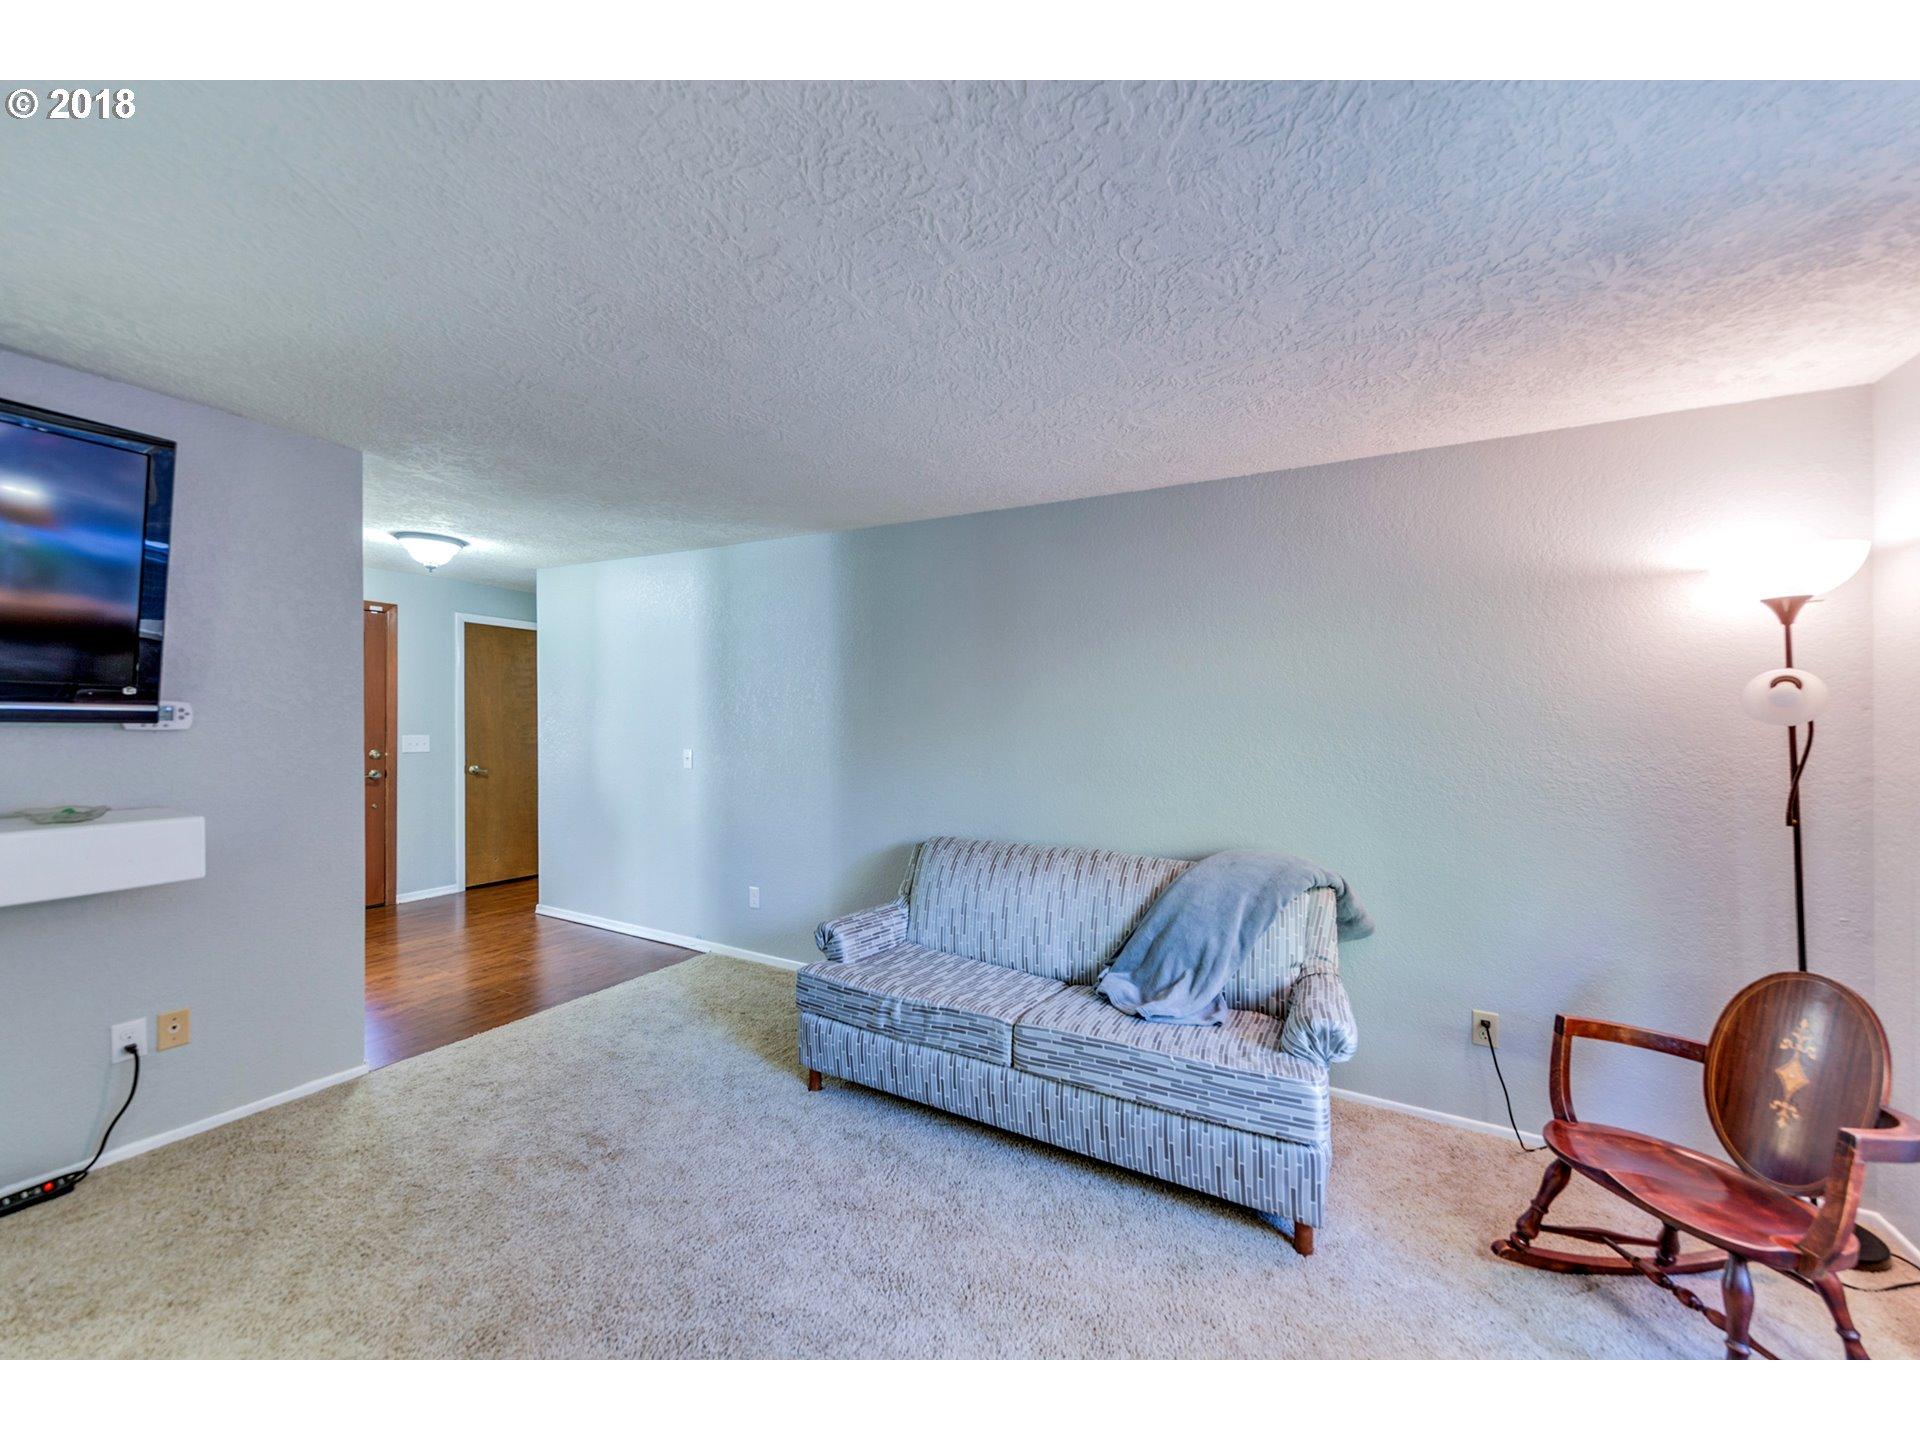 1225 NW SATARA AVE Salem, OR 97304 - MLS #: 18637115